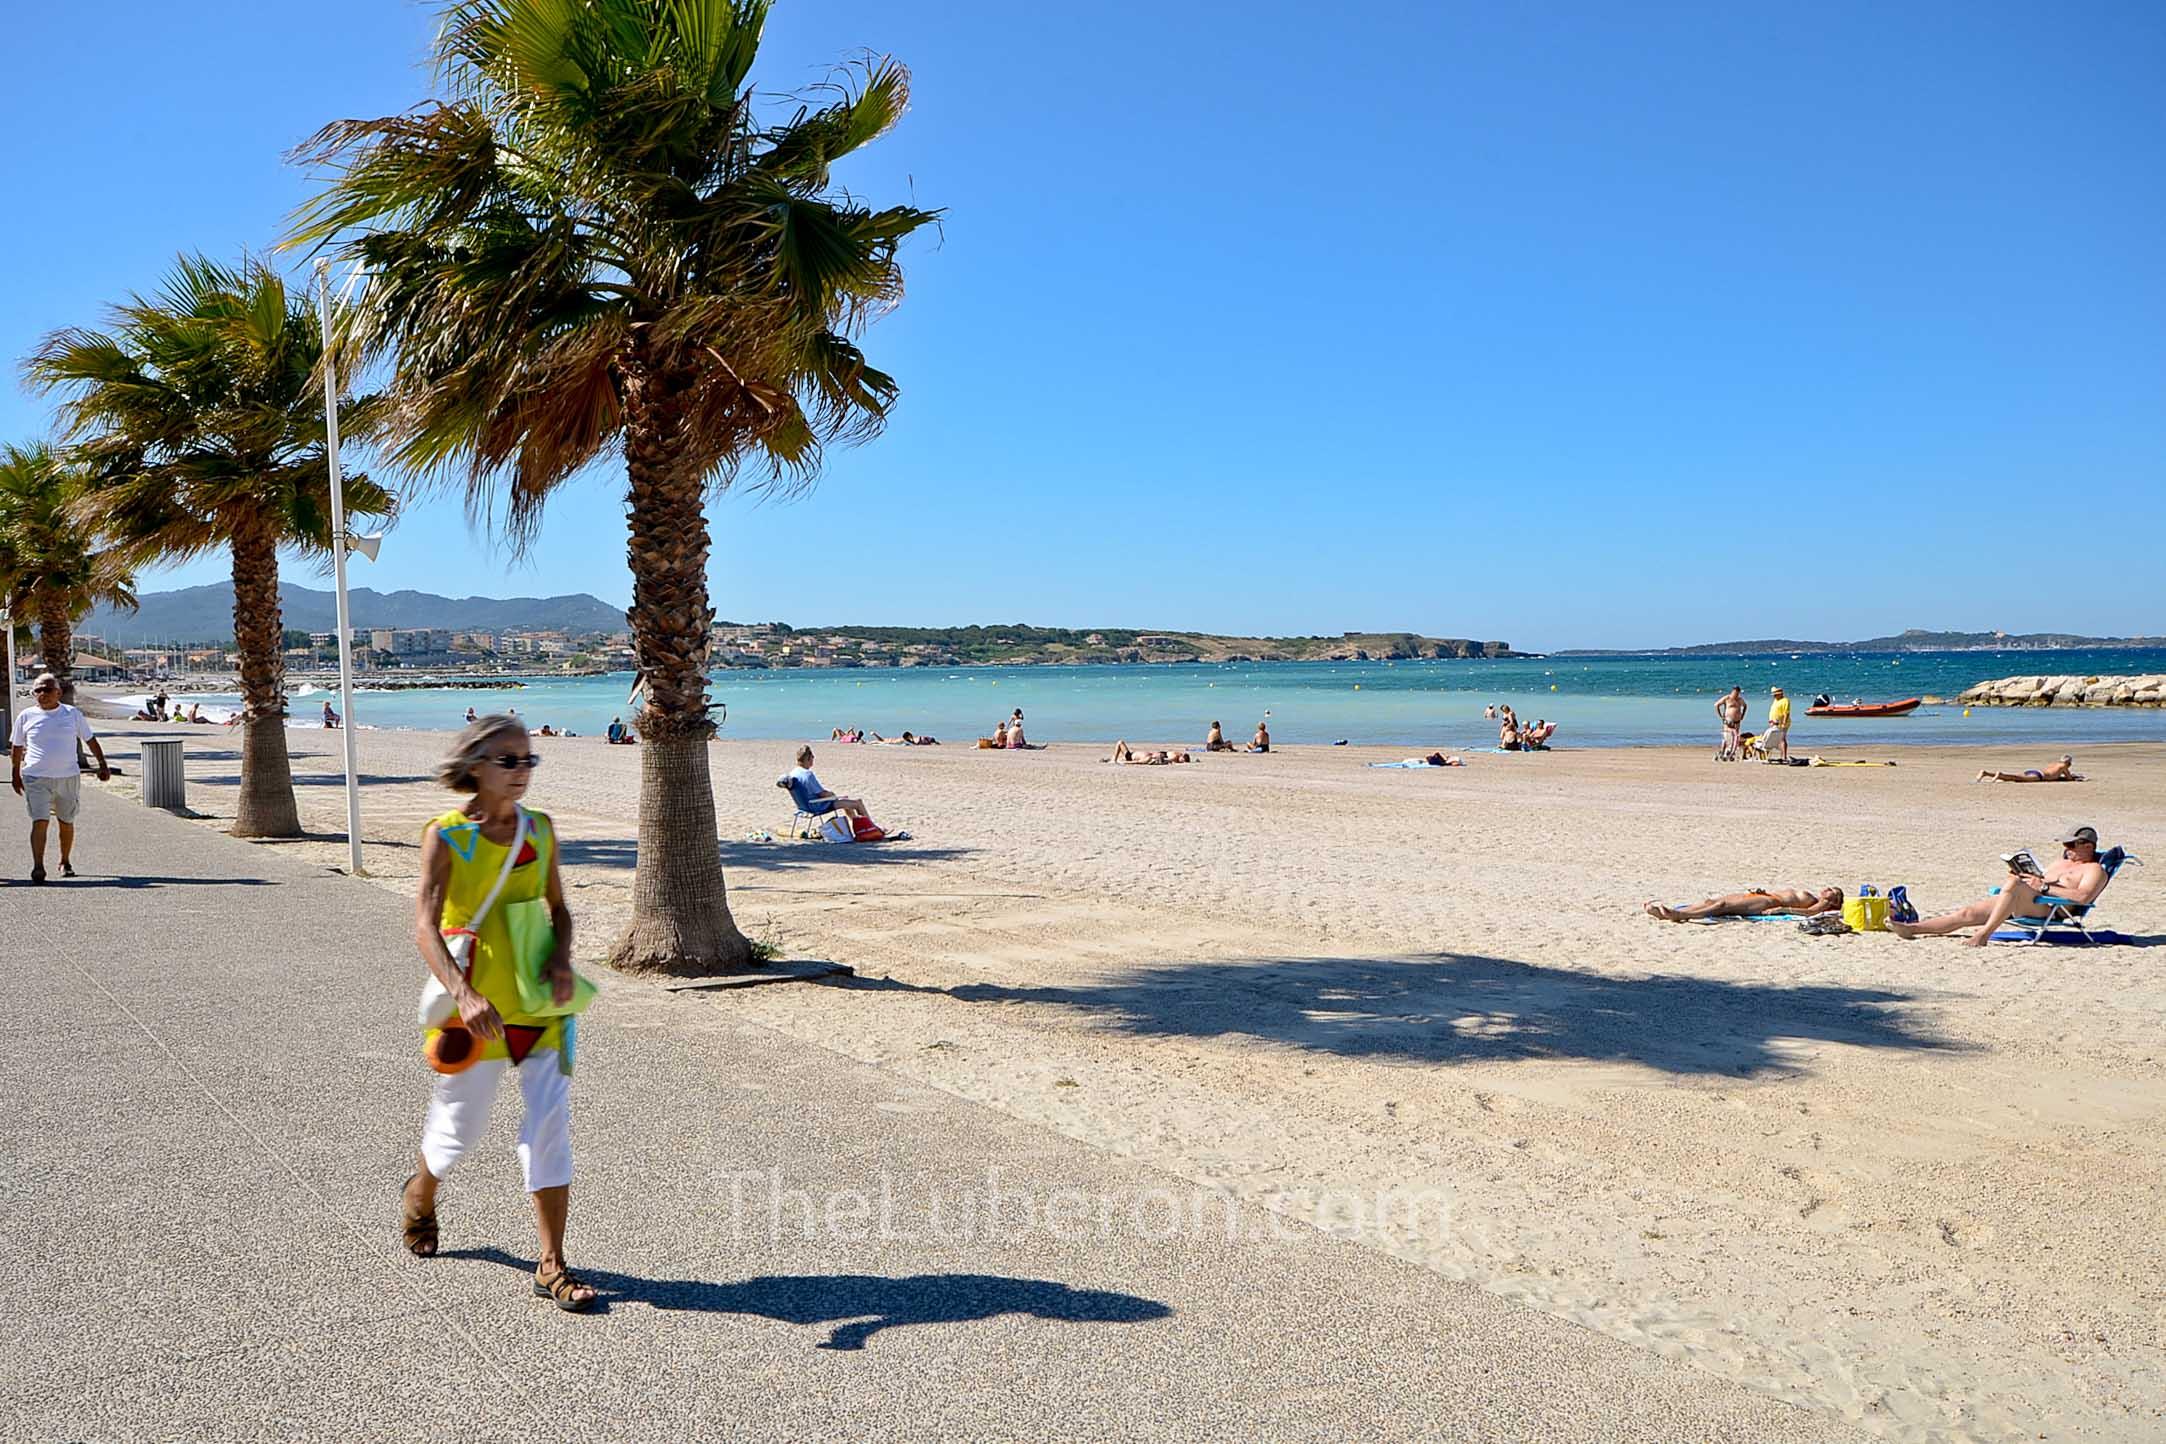 Beach walker at Sanary-sur-Mer